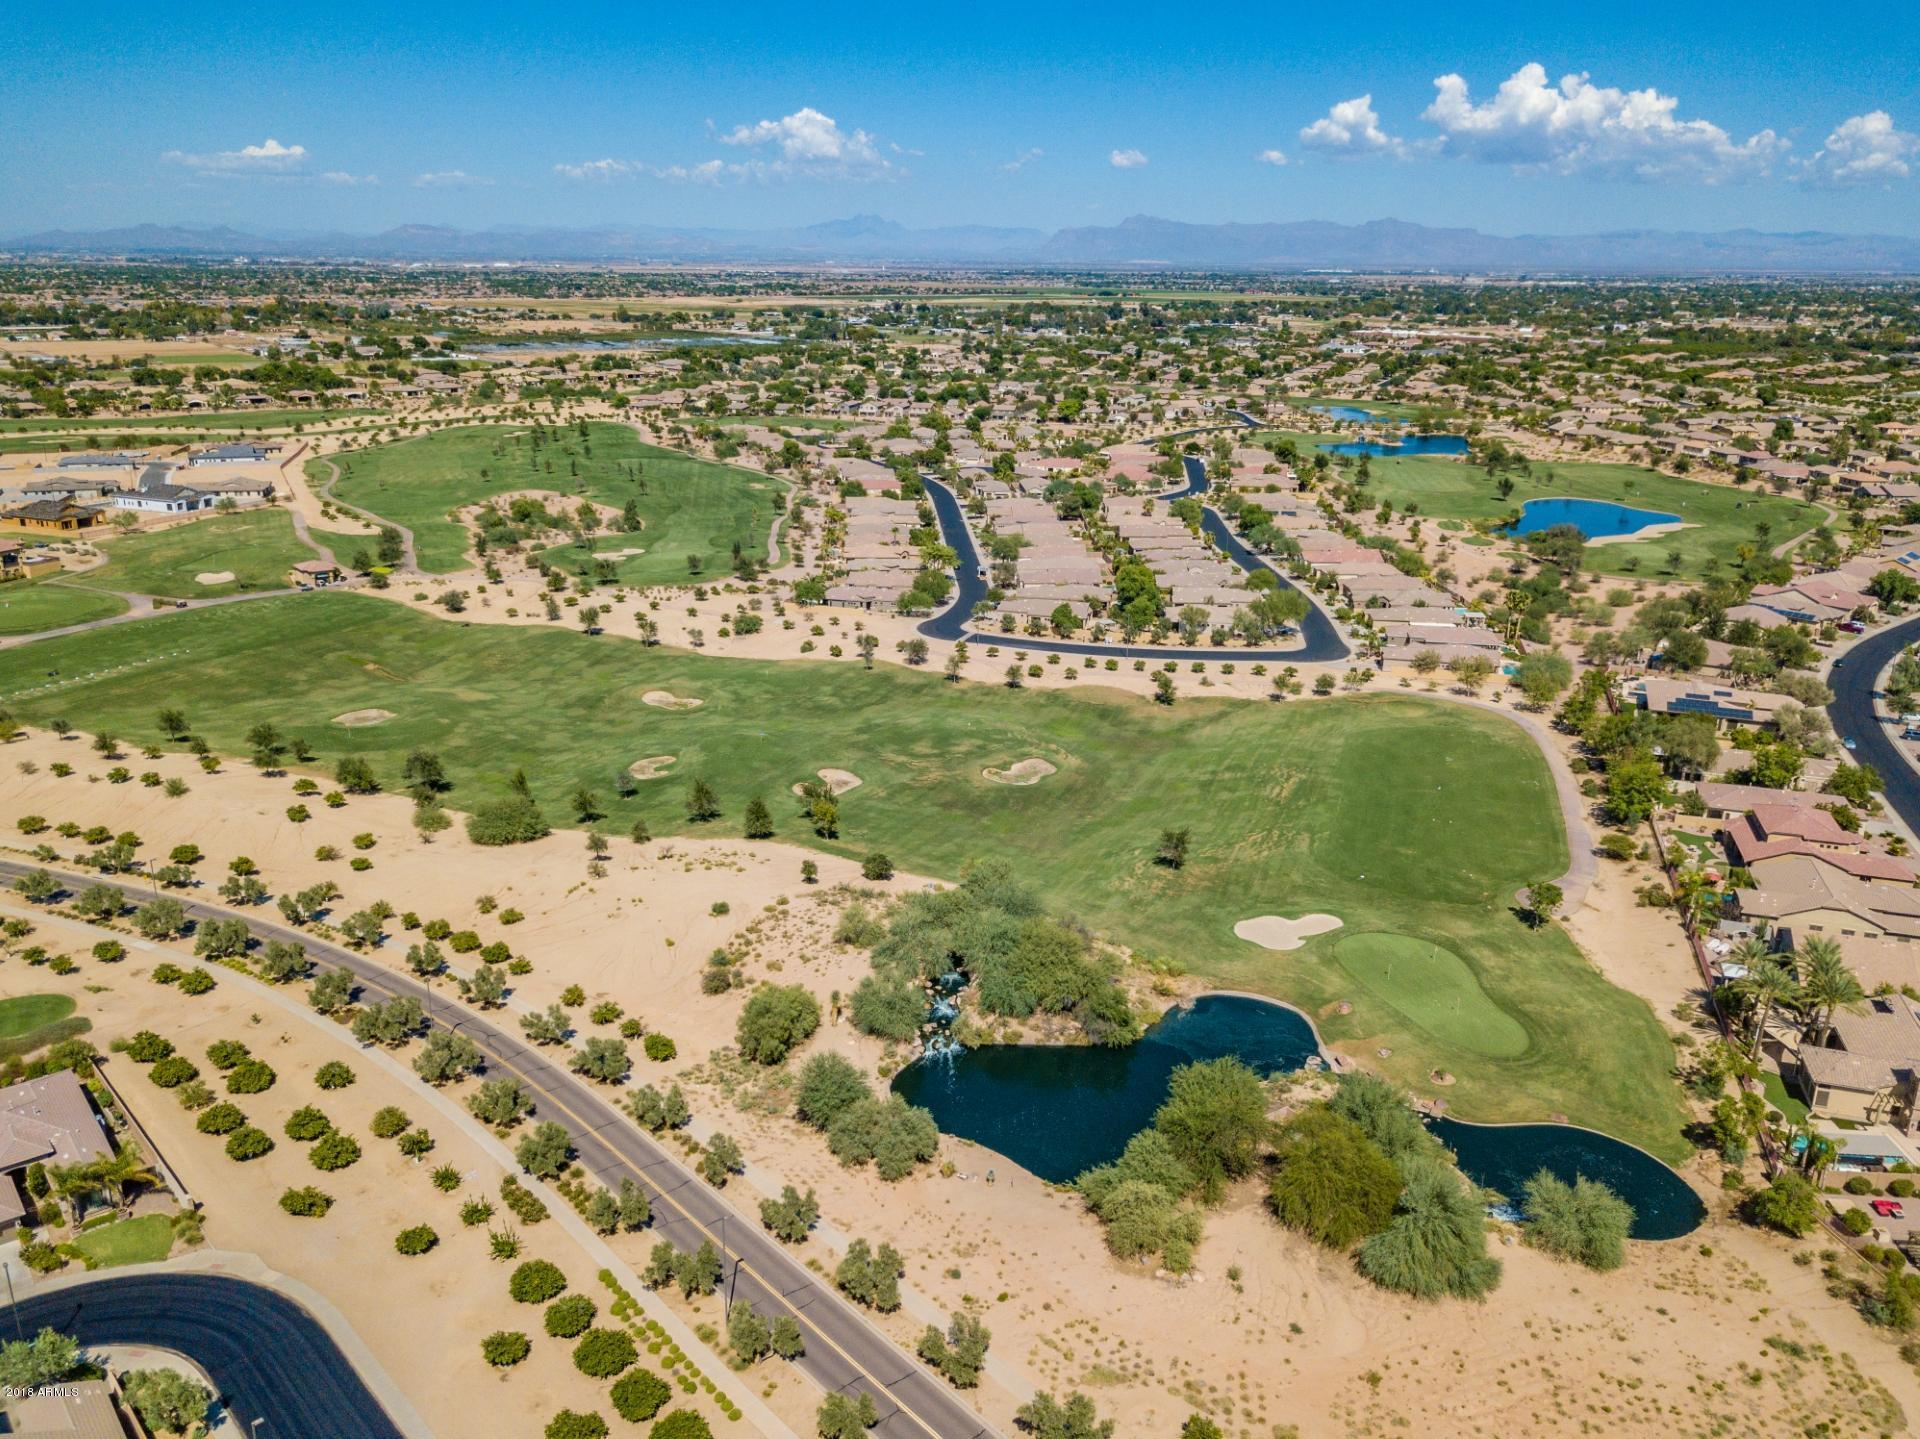 MLS 5814193 3866 E RAVENSWOOD Drive, Gilbert, AZ 85298 Seville